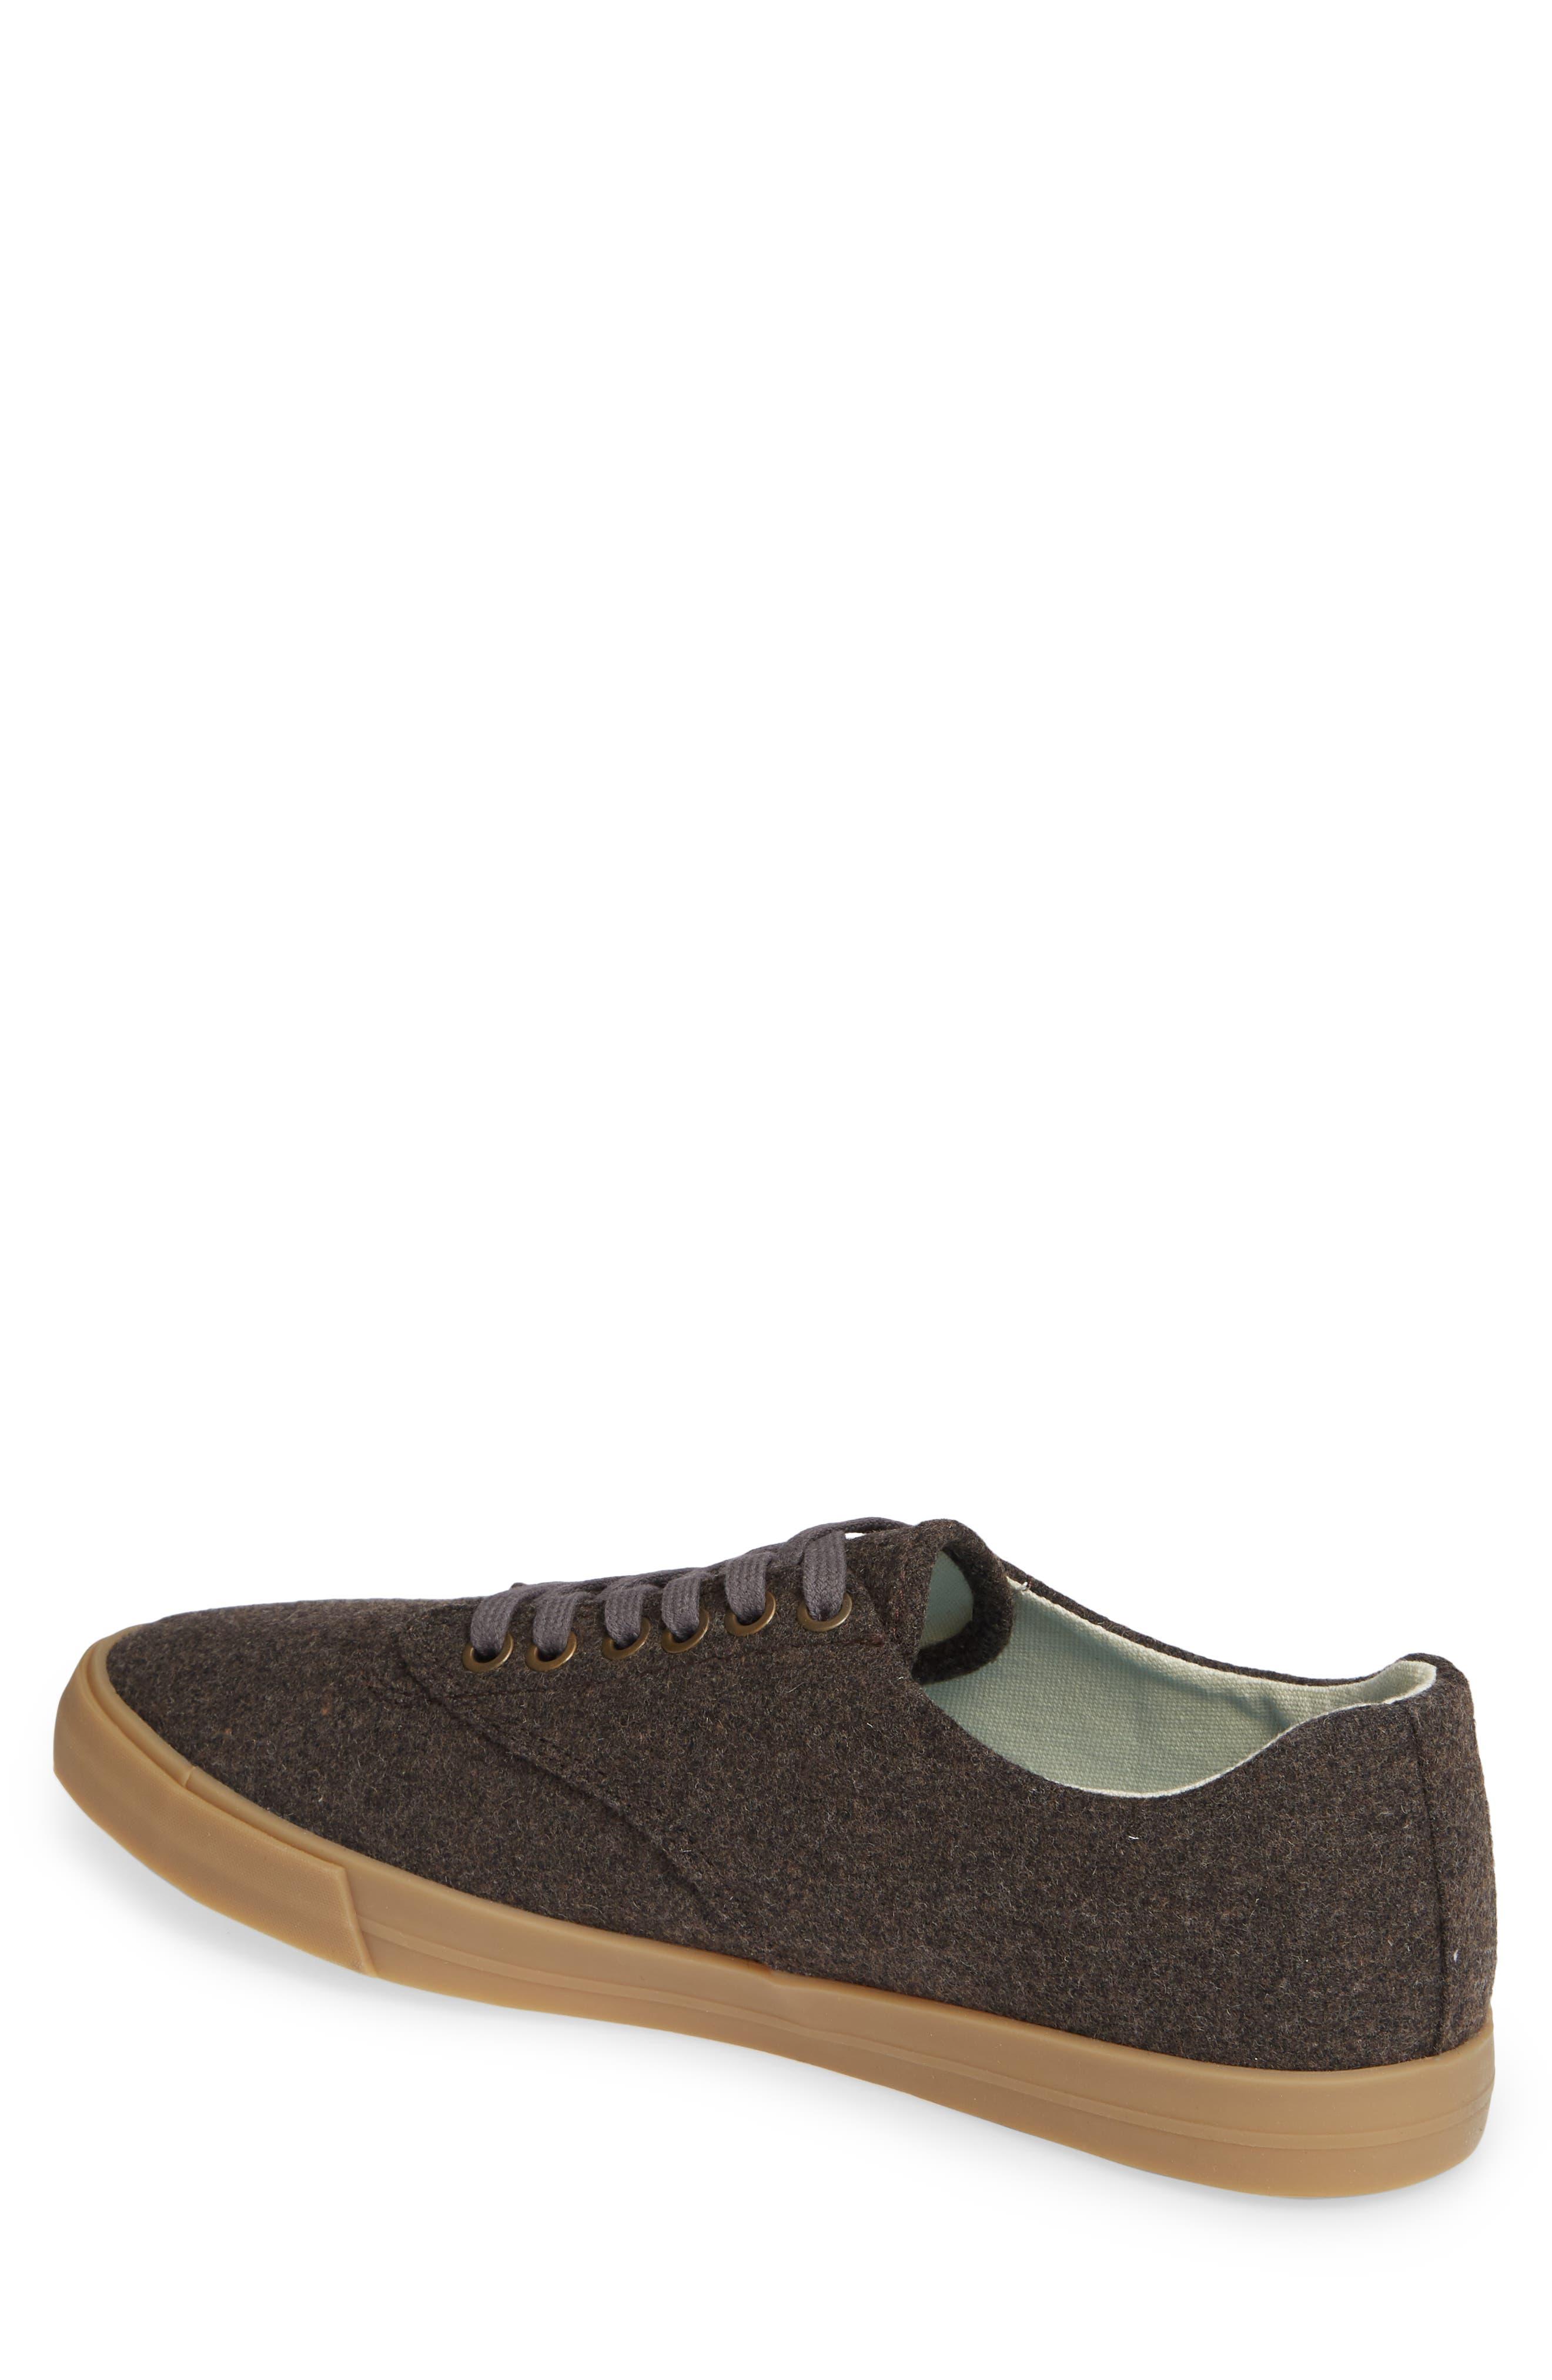 Hermosa Grayers Sneaker,                             Alternate thumbnail 2, color,                             DARK BROWN WOOL FLANNEL